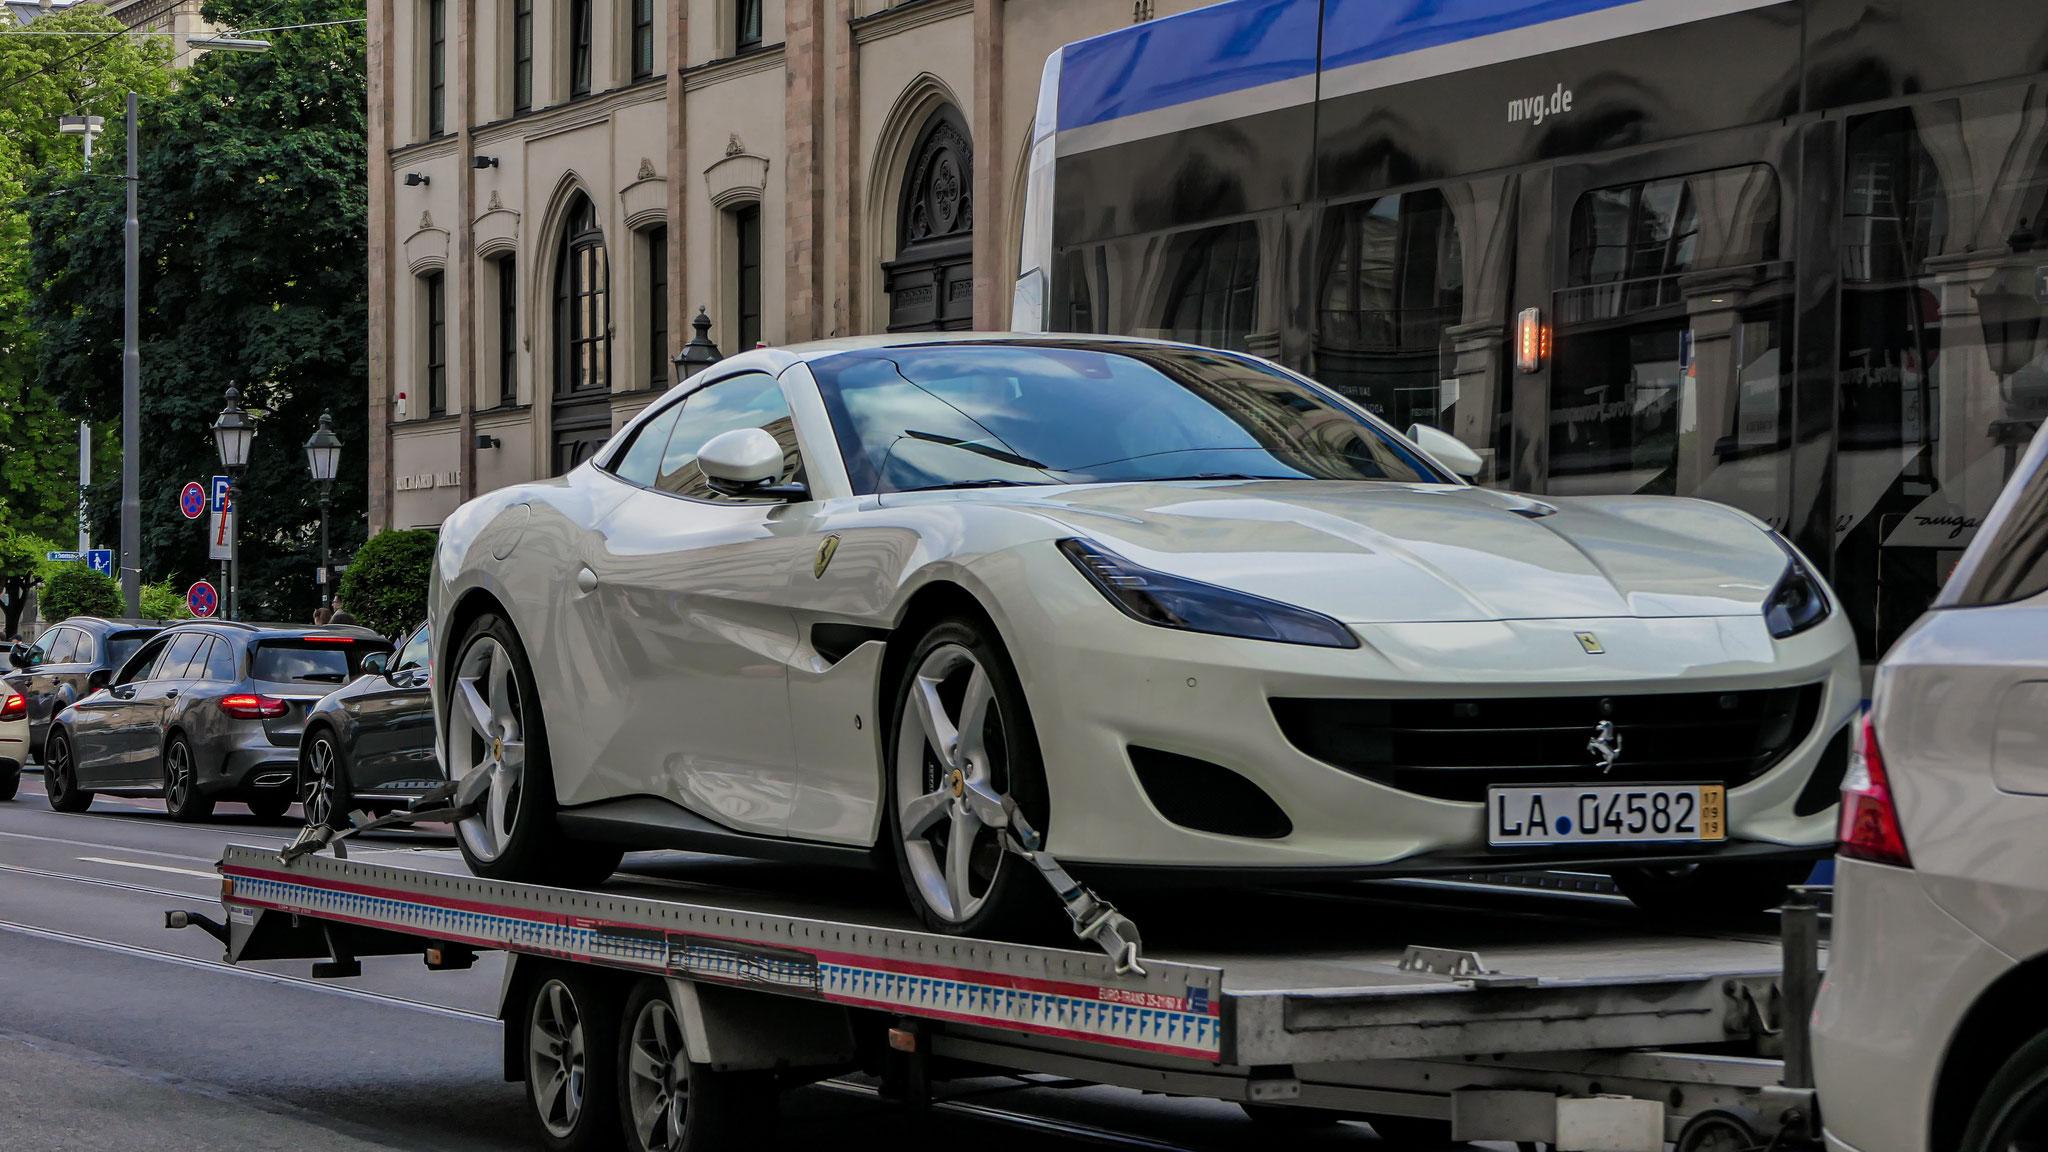 Ferrari Portofino - LA-04582